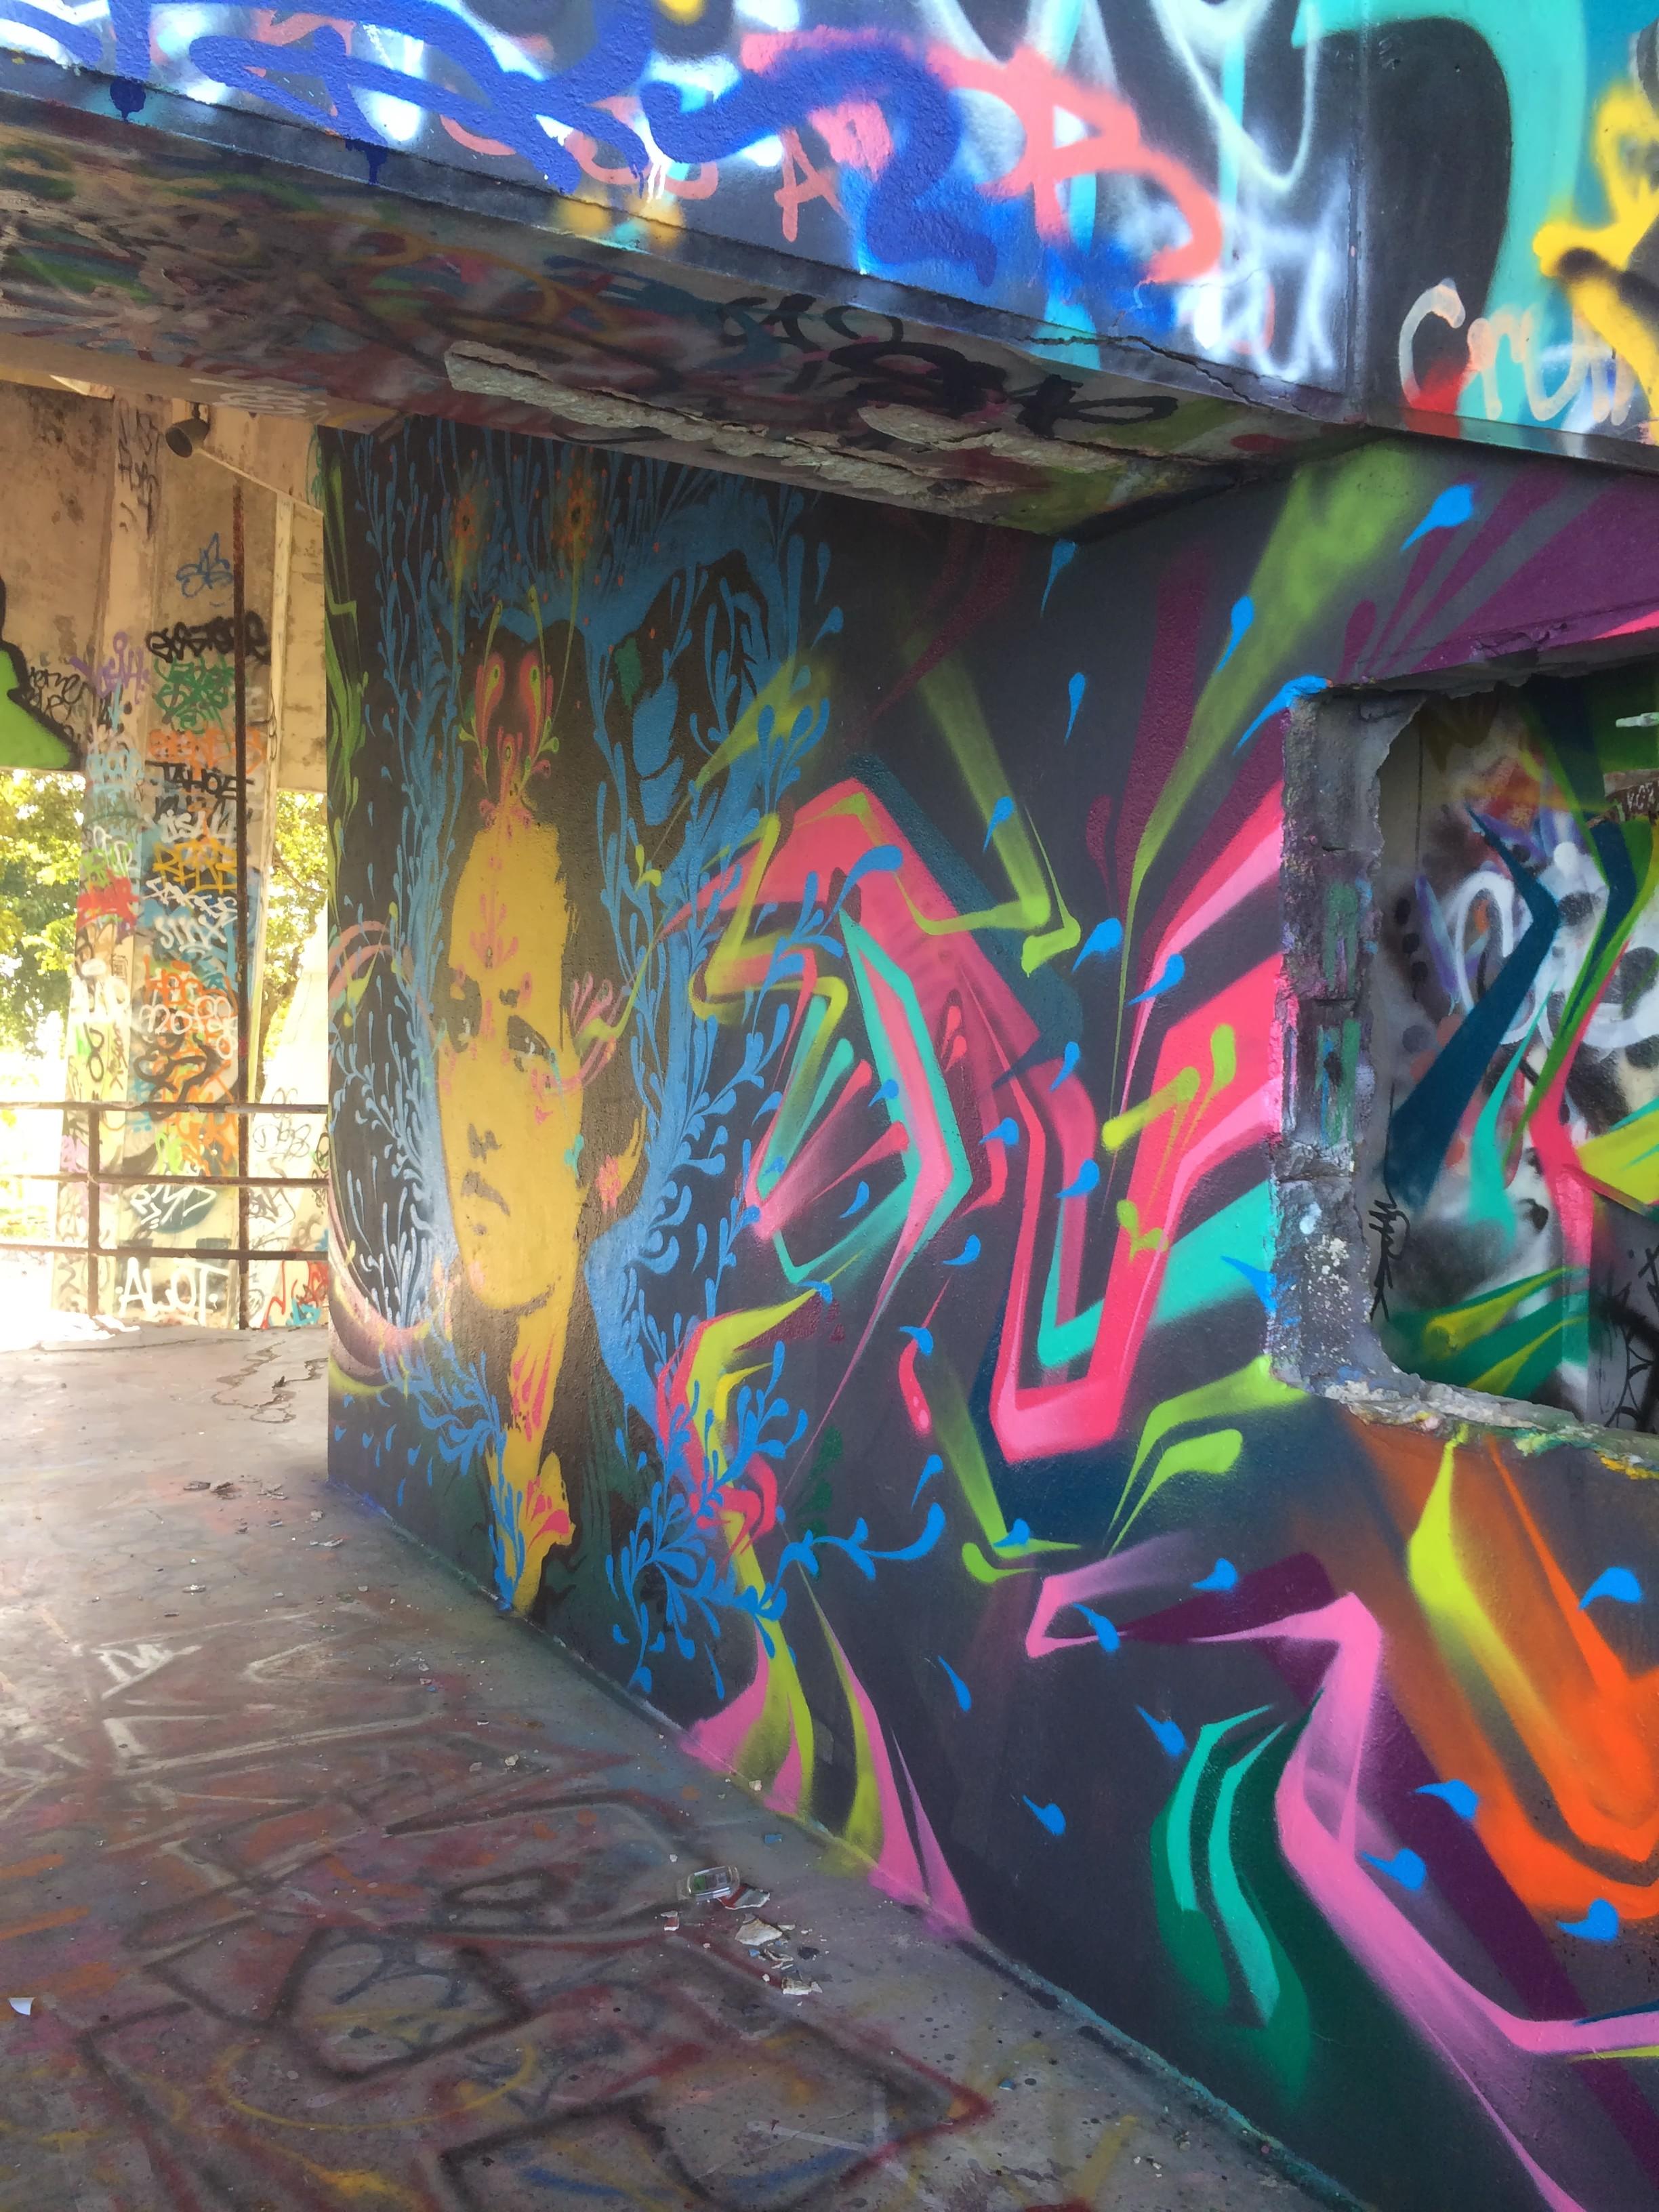 stinkfish- miami marine stadium mural project (part 1)